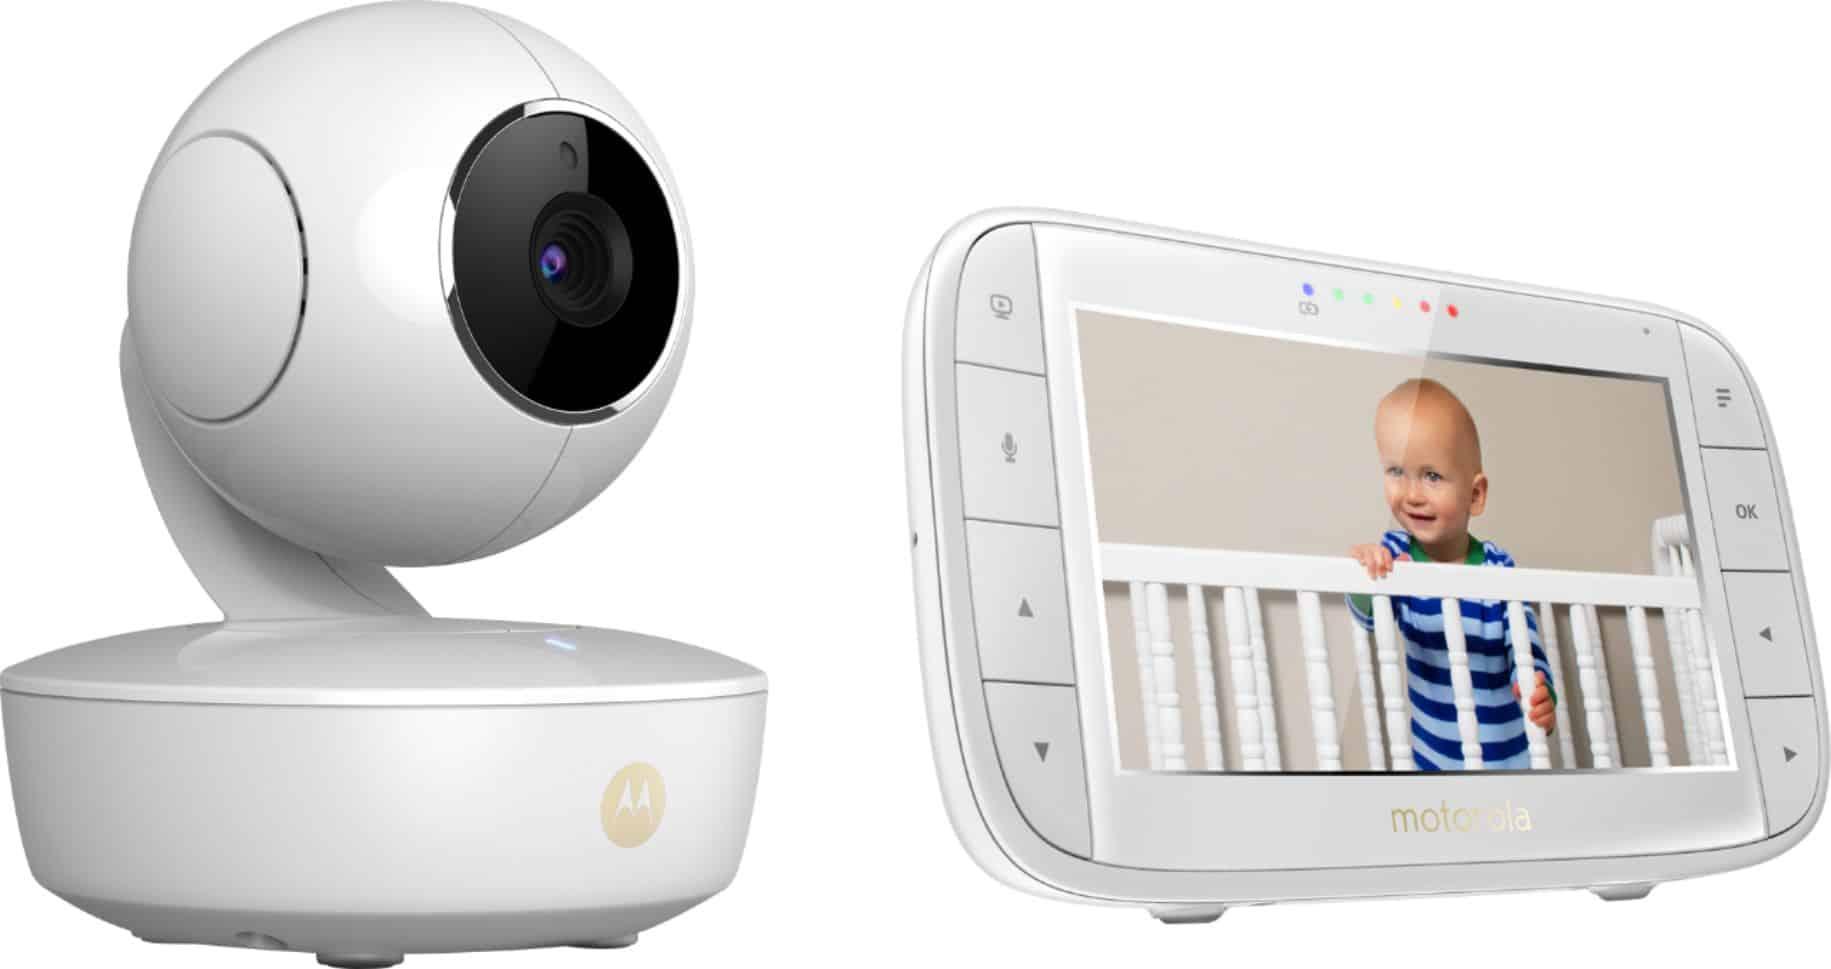 bebek kamera türleri